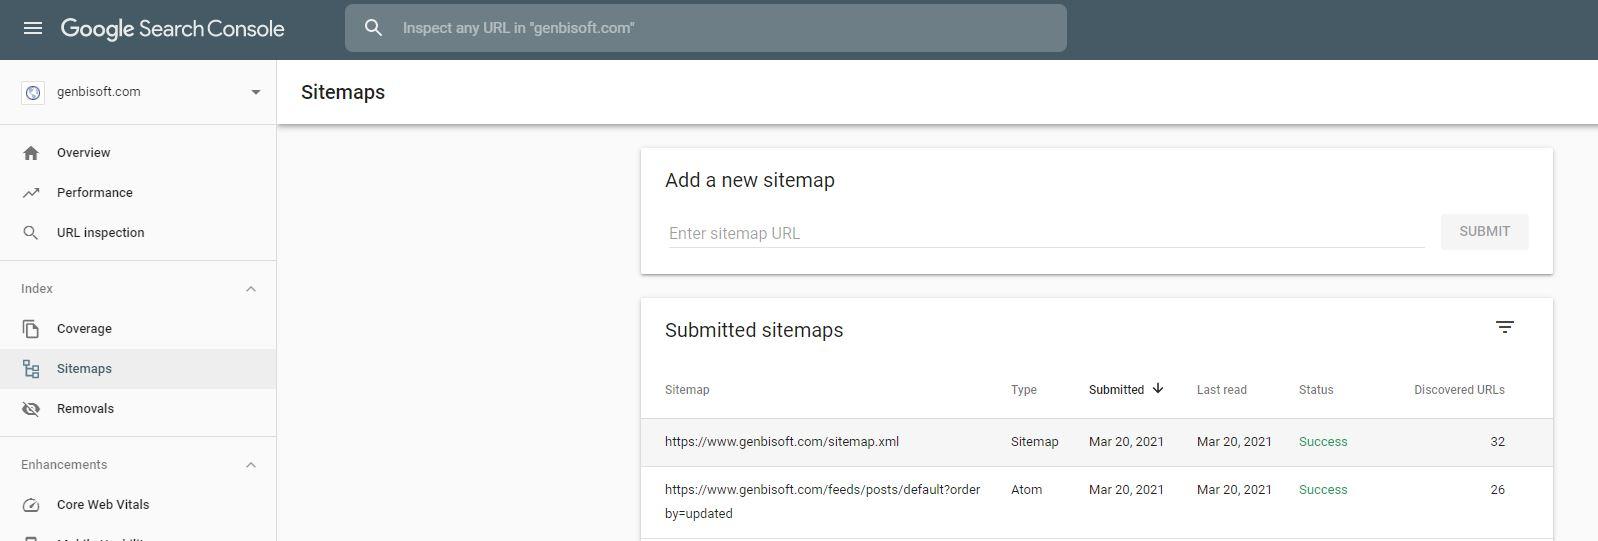 submit sitemap ke google search console (RahmanCyber.NET)